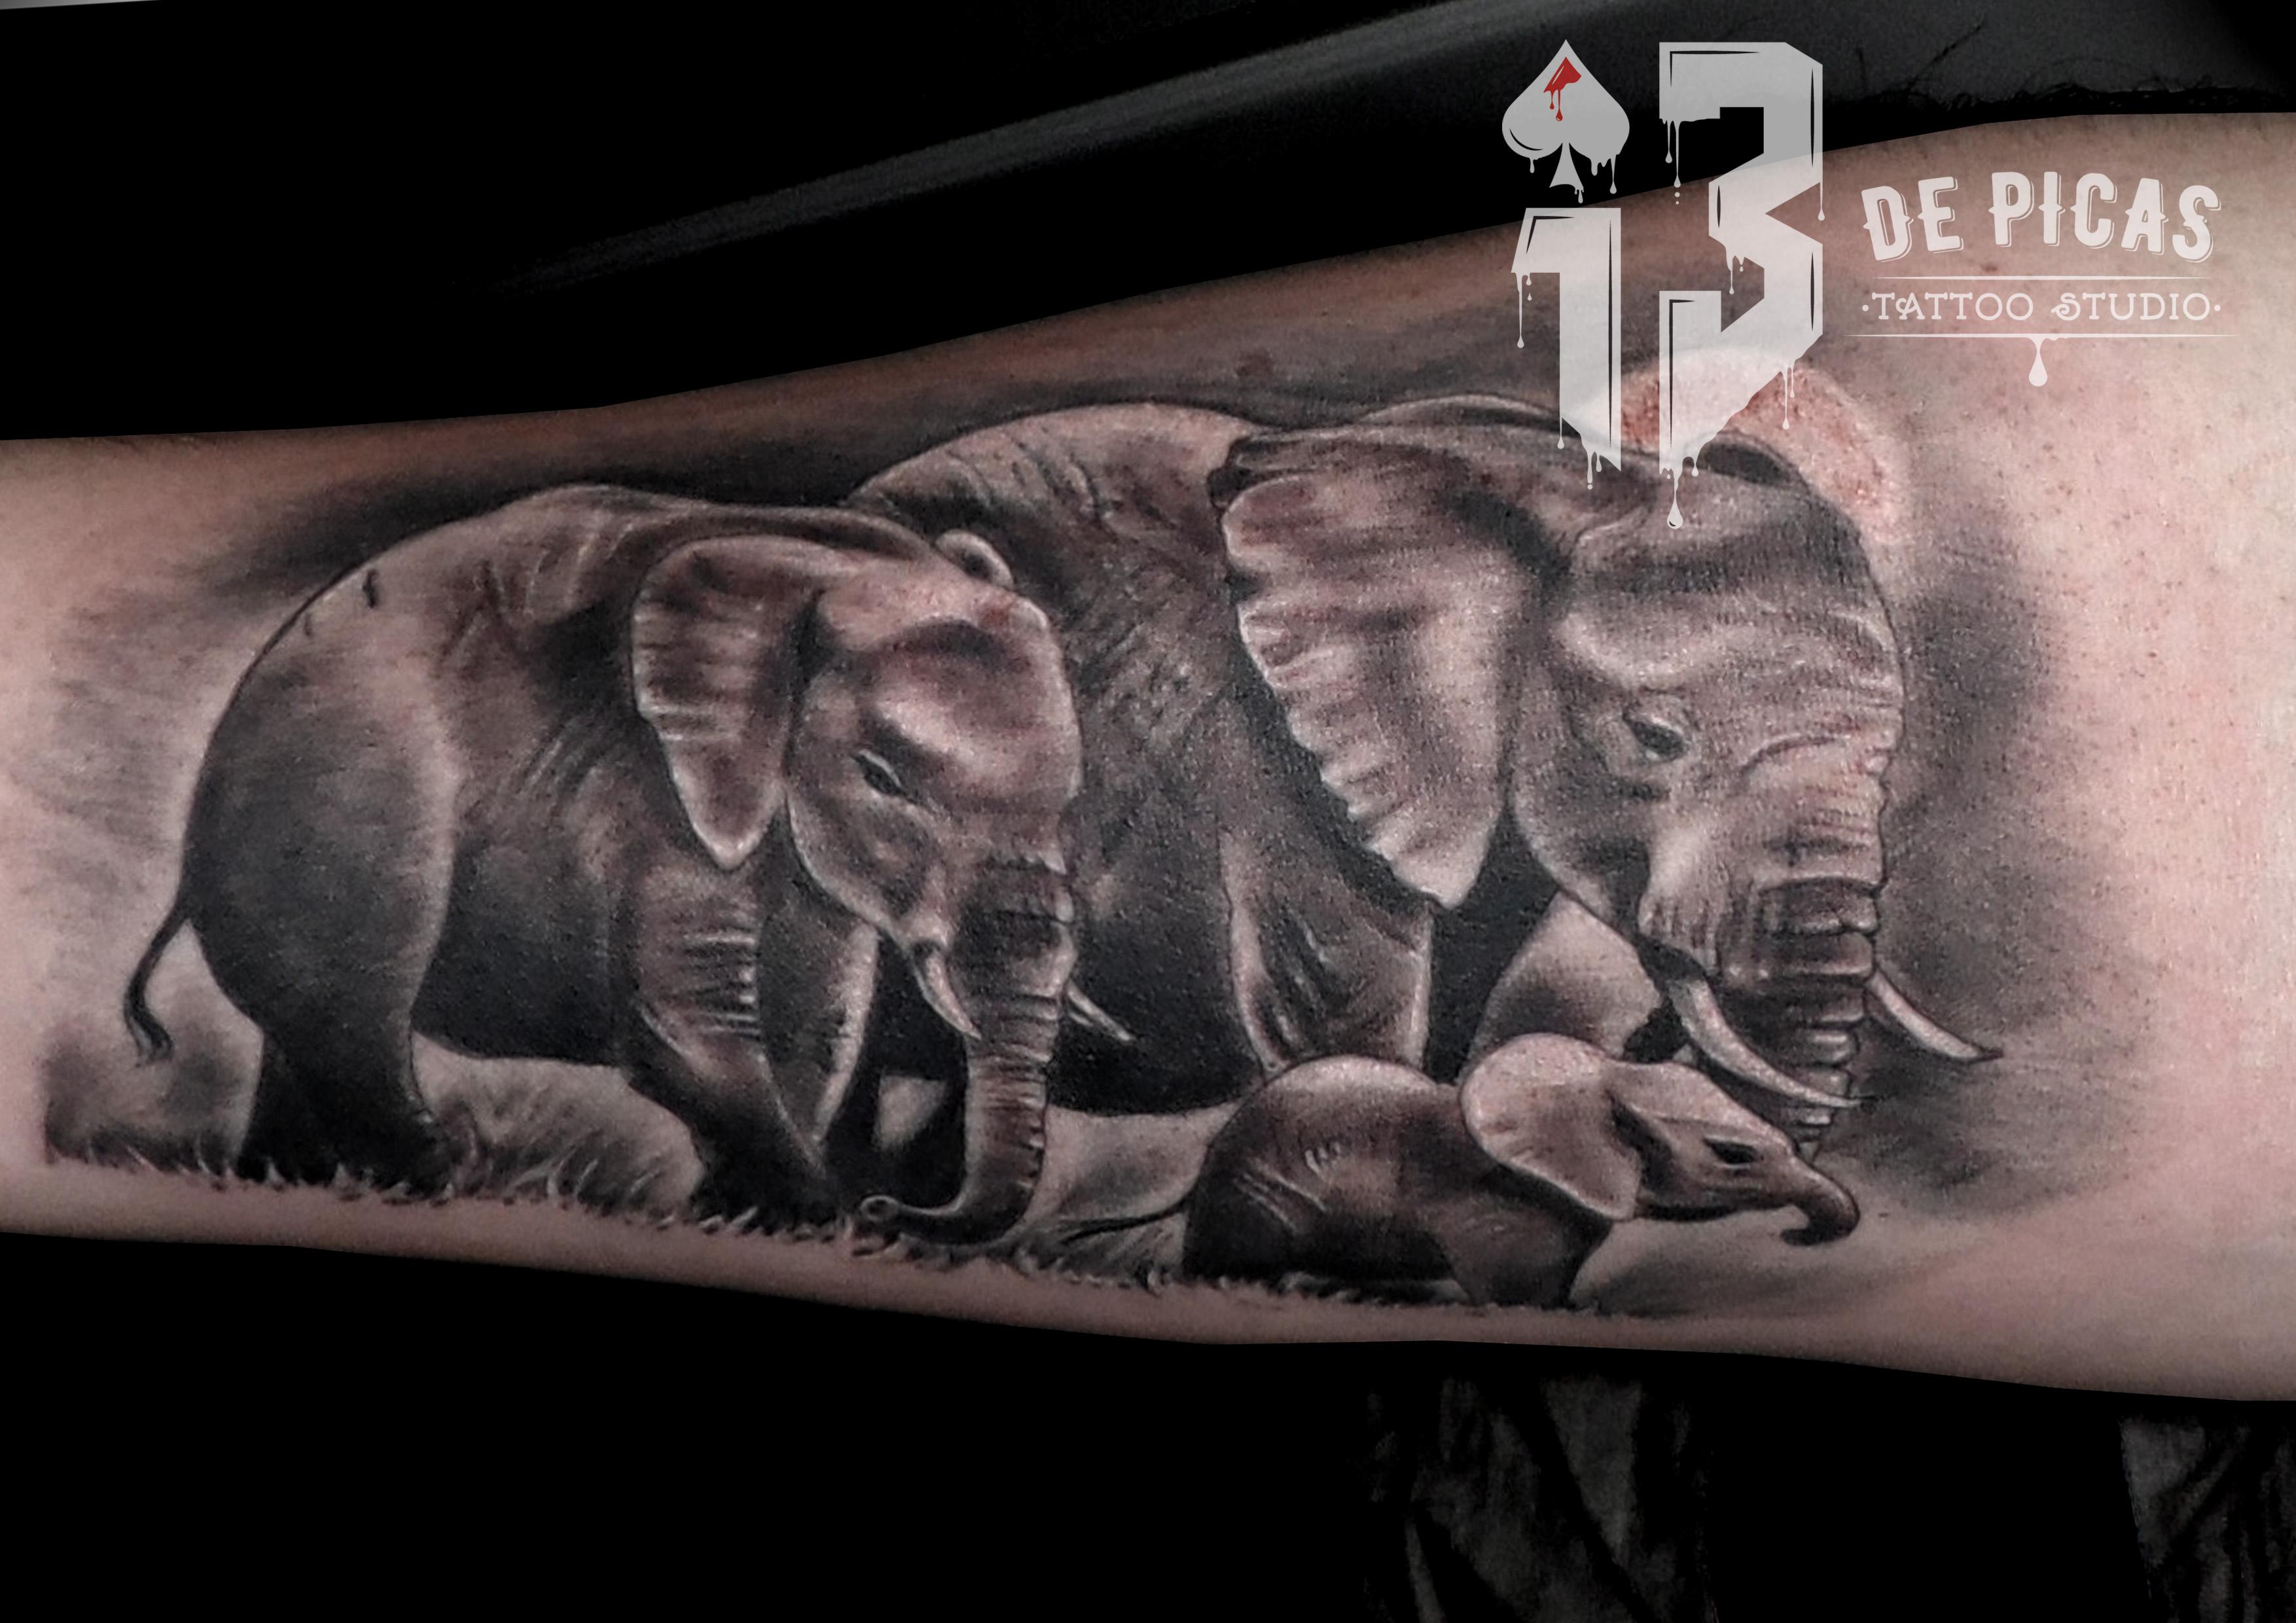 Realismo Tattoos